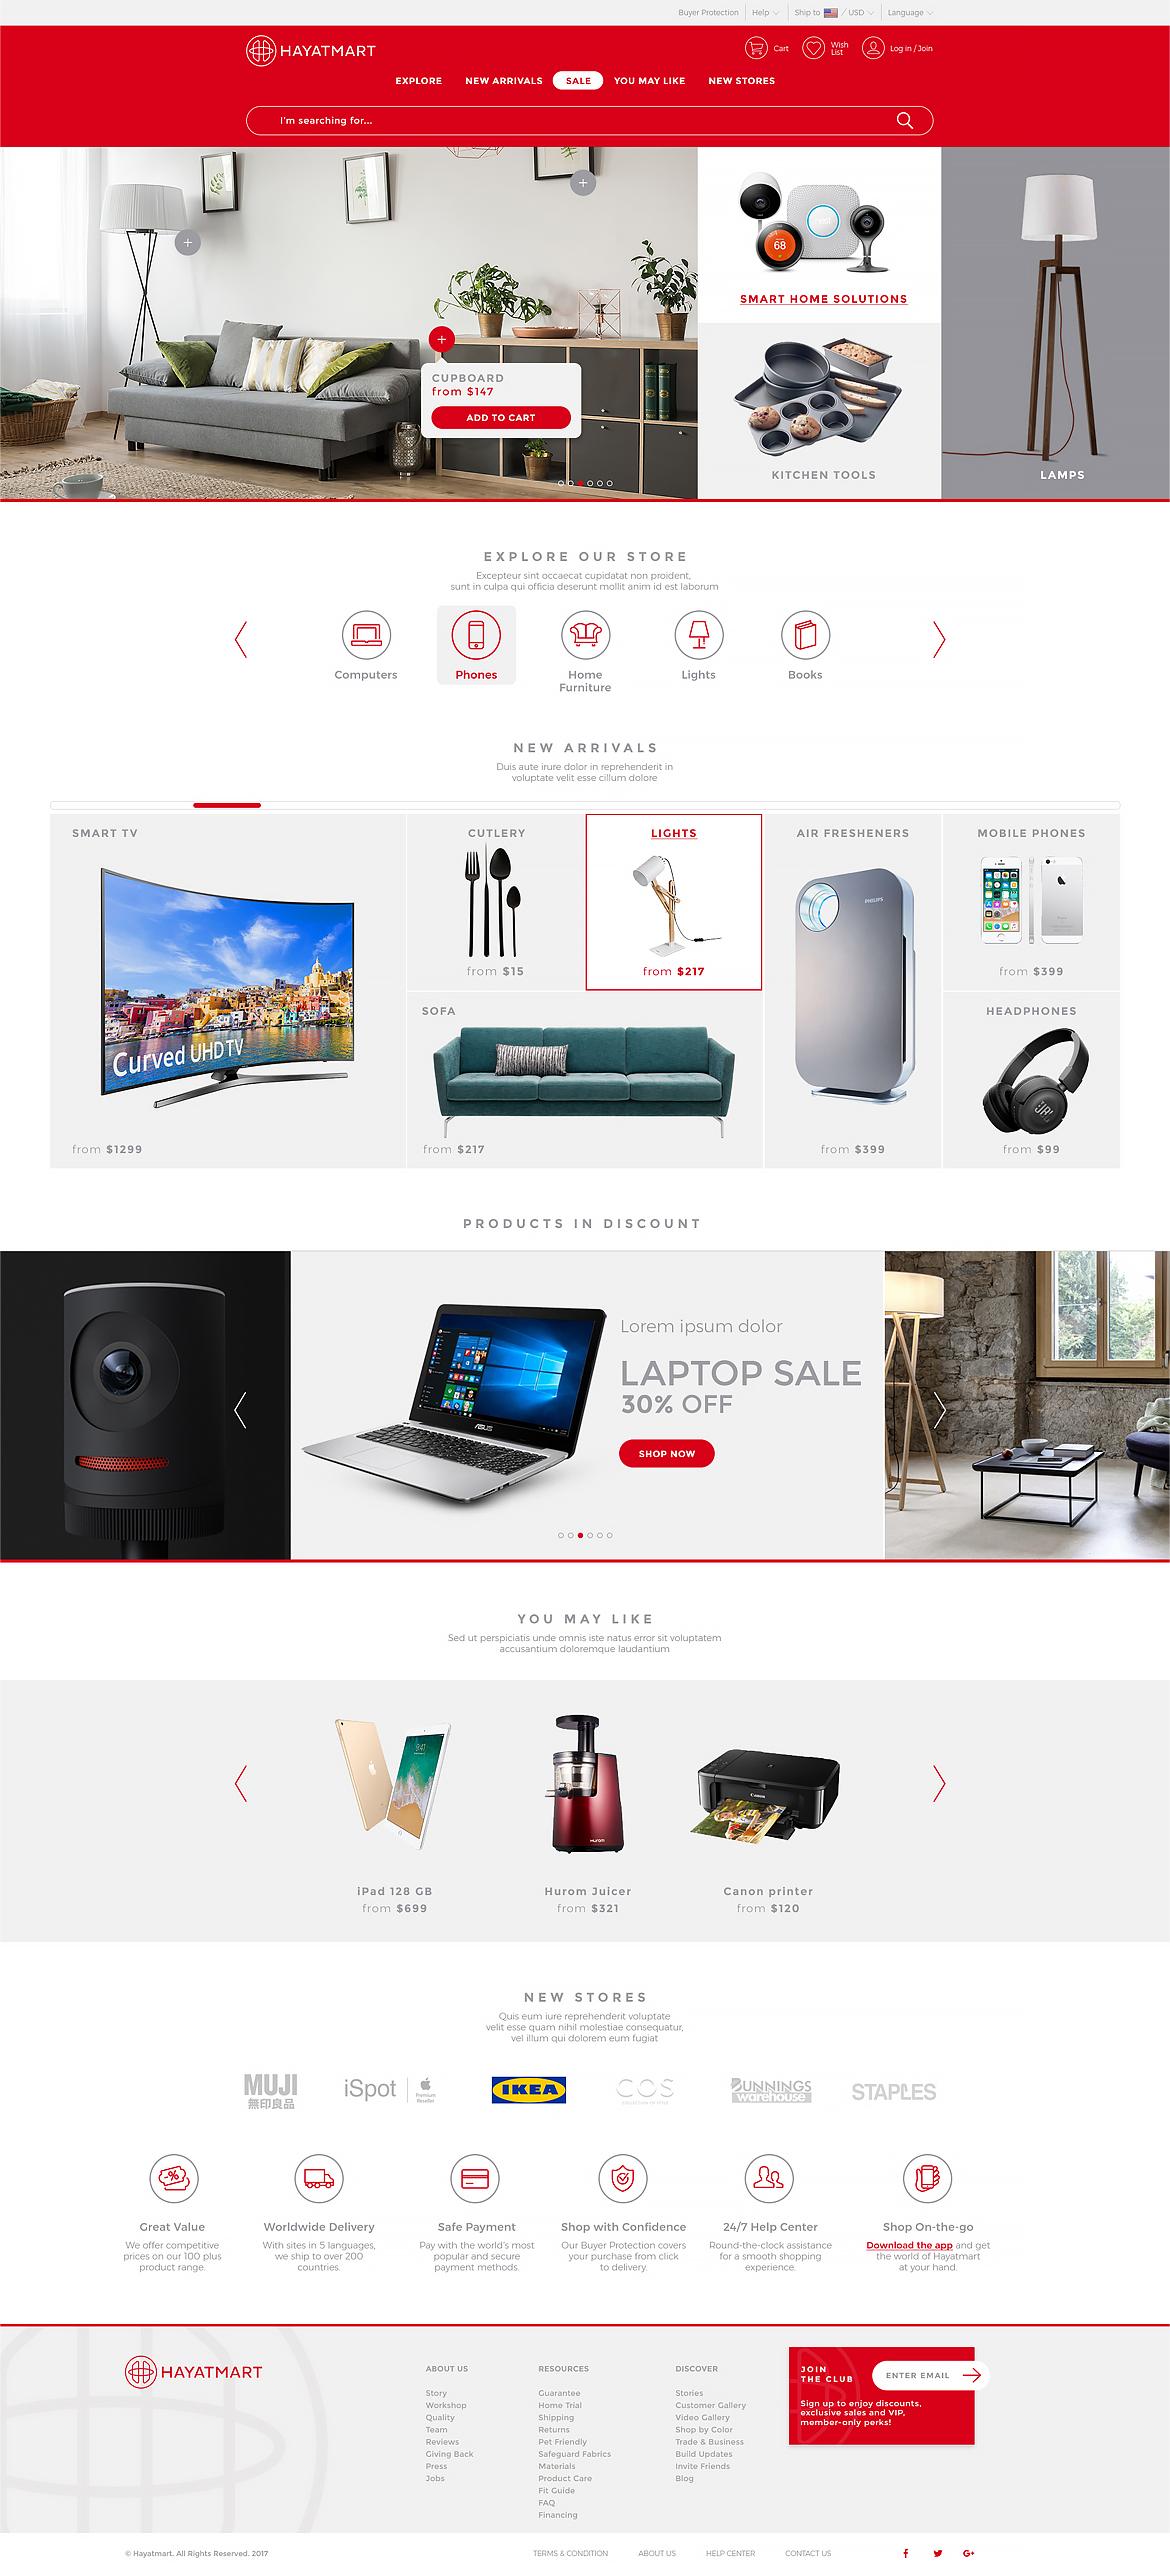 Hayatmart web design by Dawid Koniuszewski Design